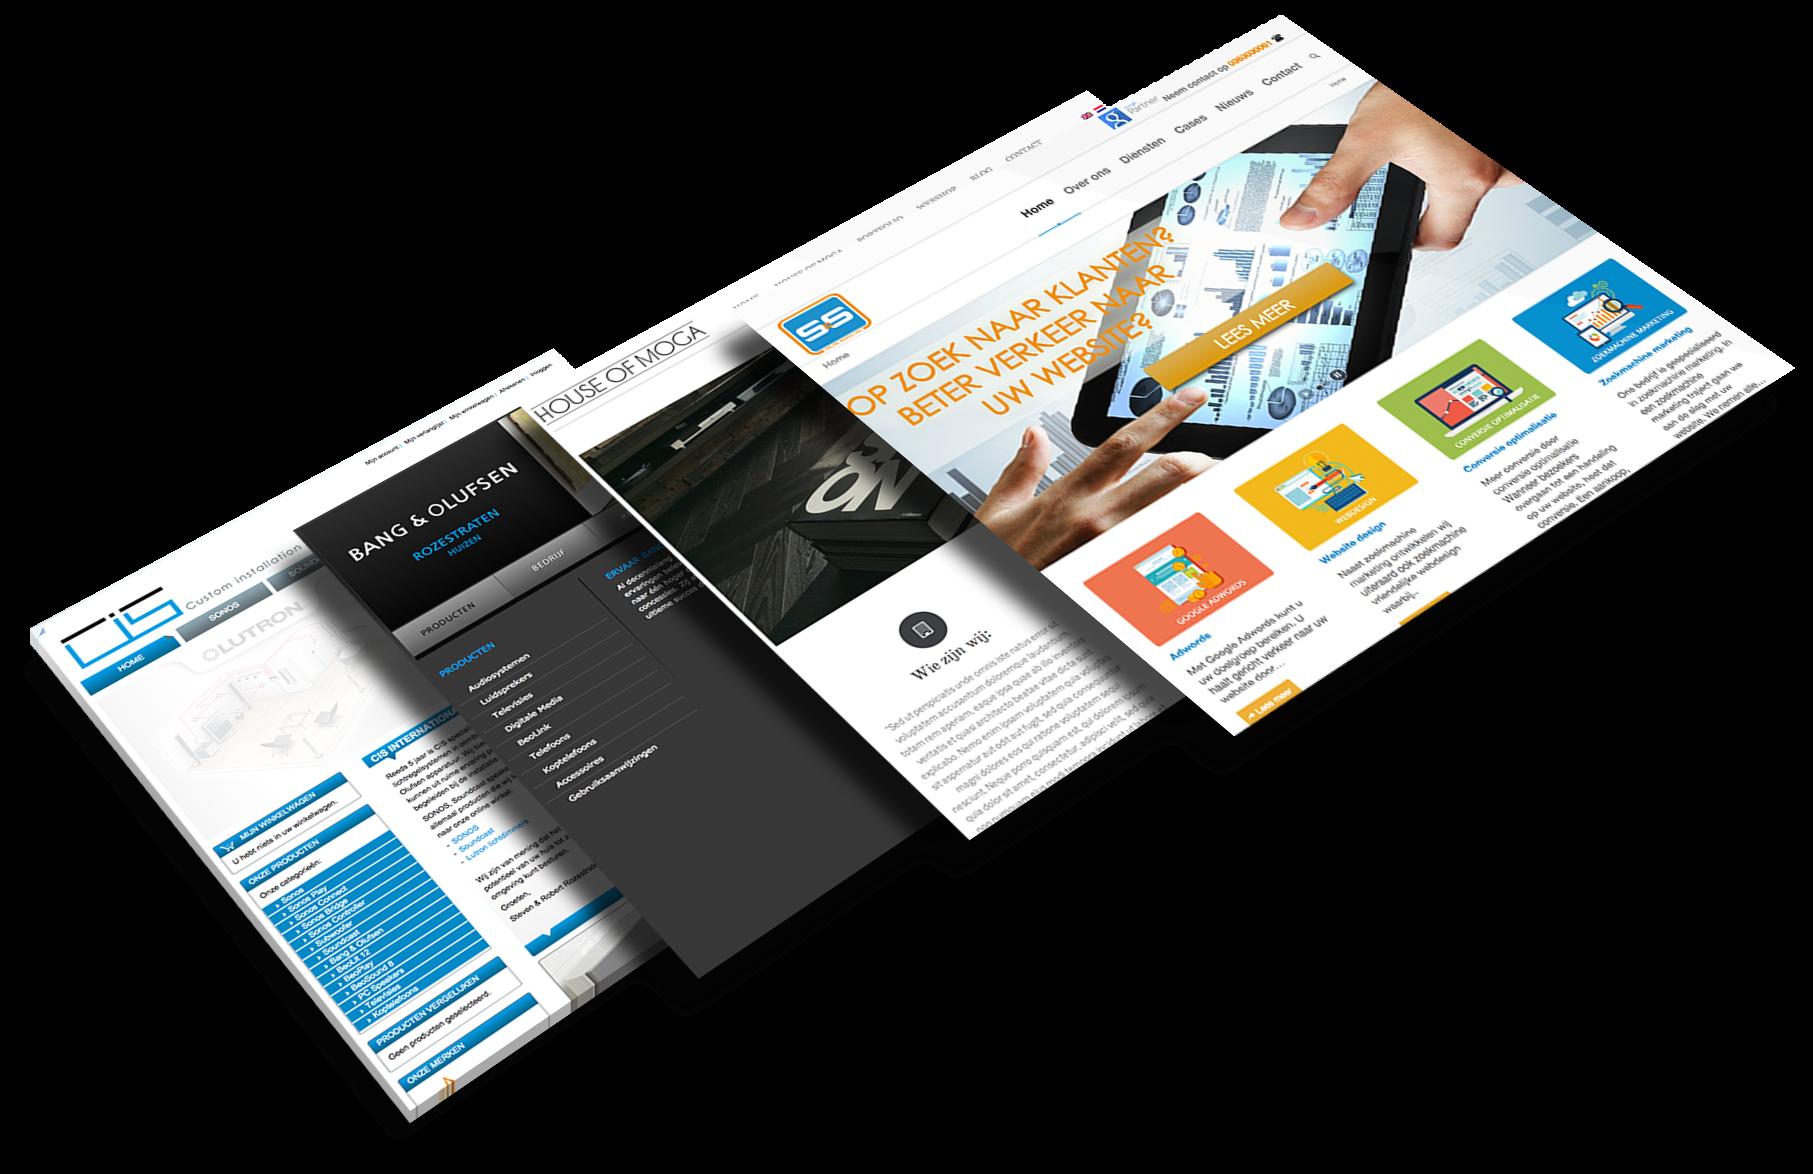 websites webdesign pagina